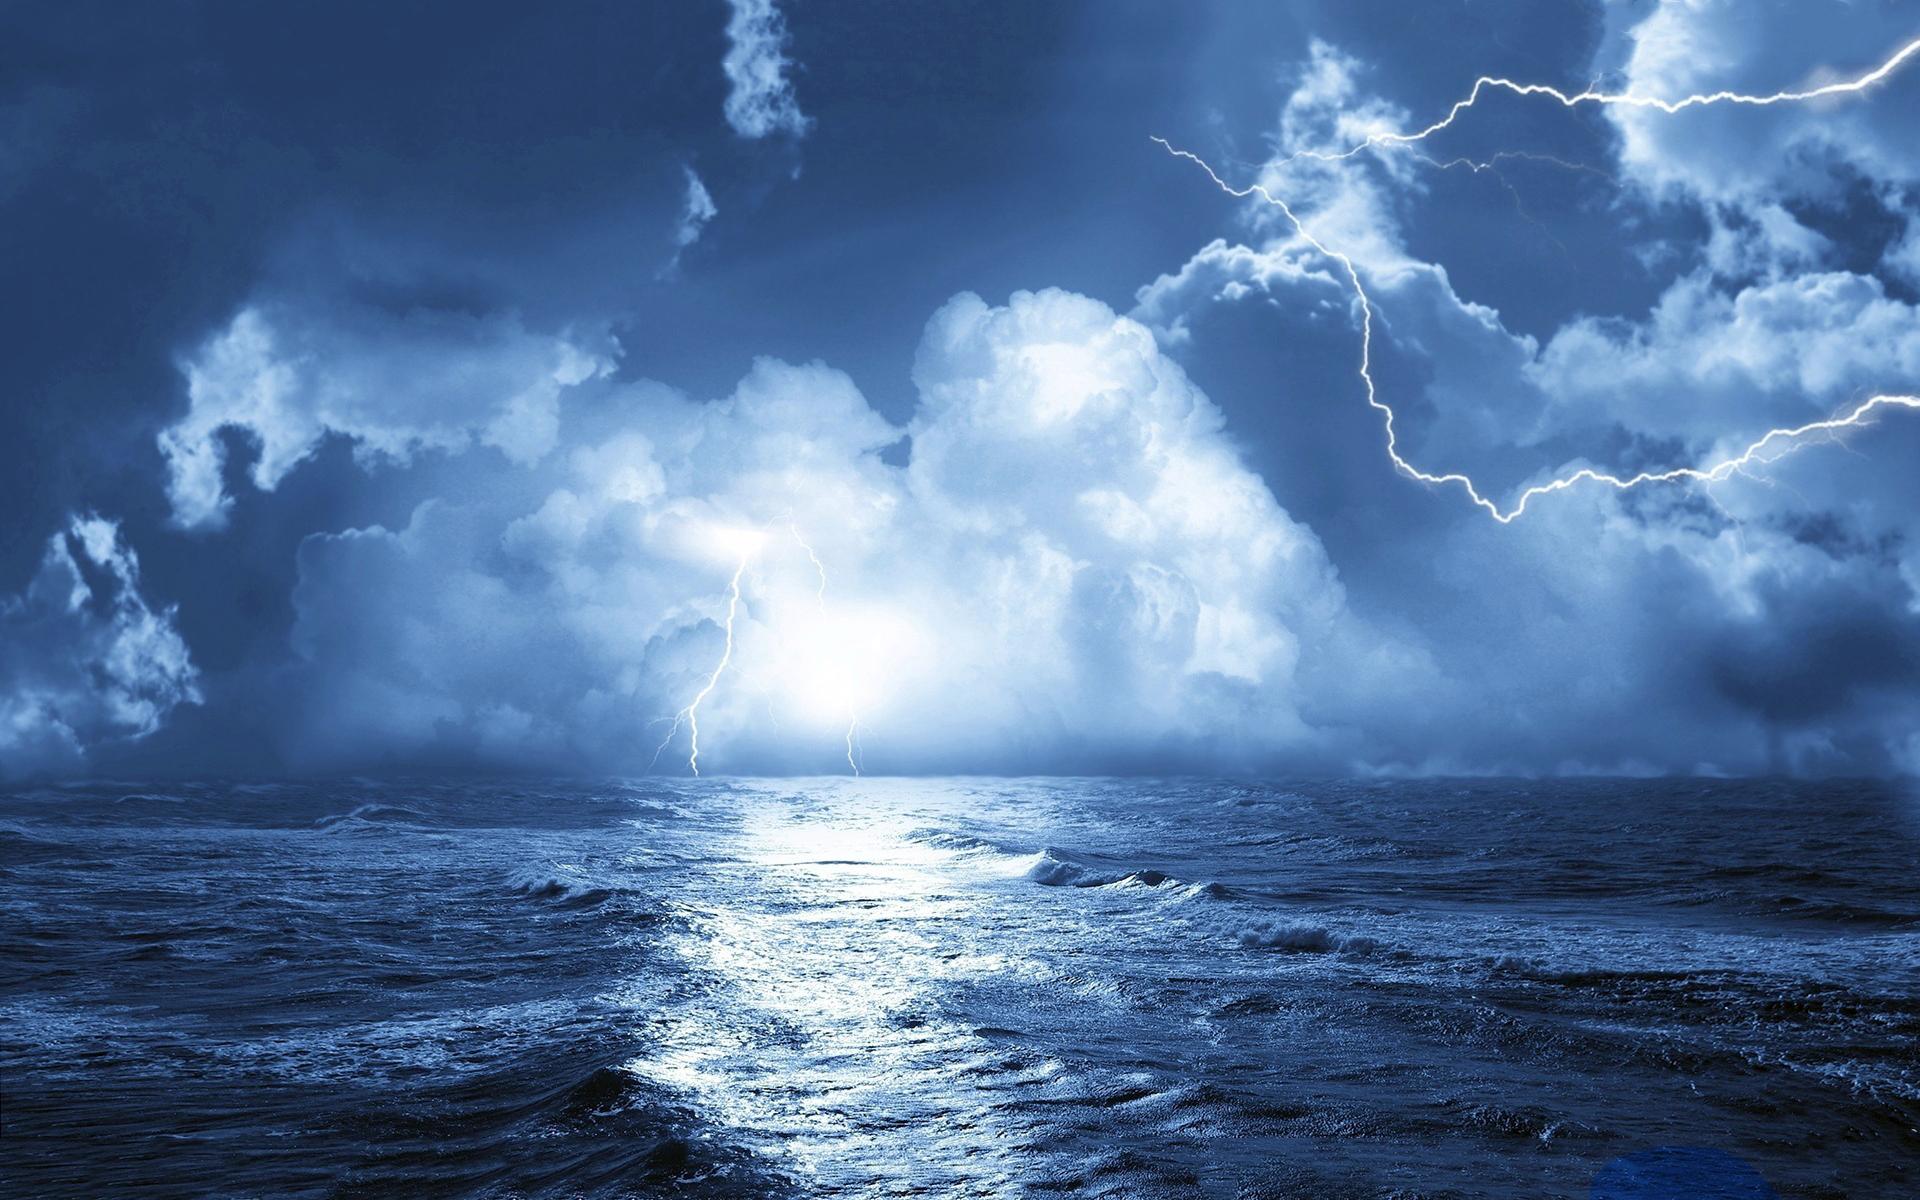 storm-over-sea